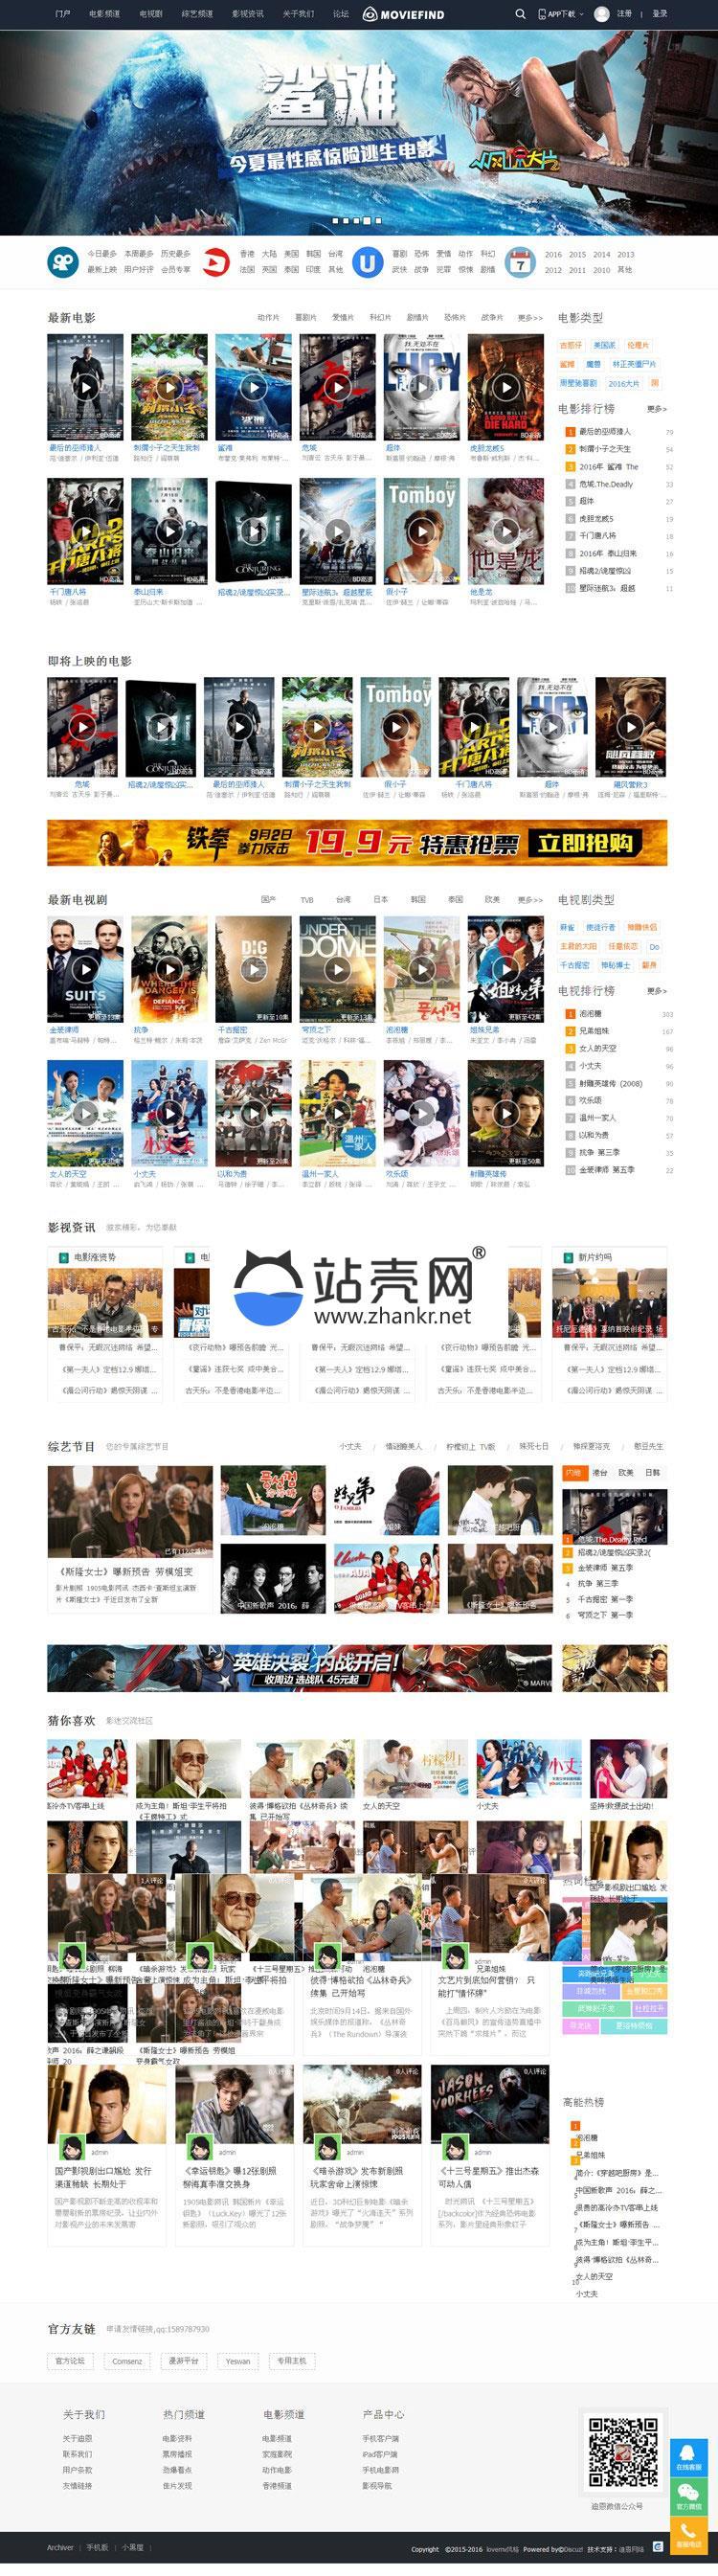 Discuz x3.2模板 迪恩 电影电视剧视频 商业版 GBK_源码下载插图